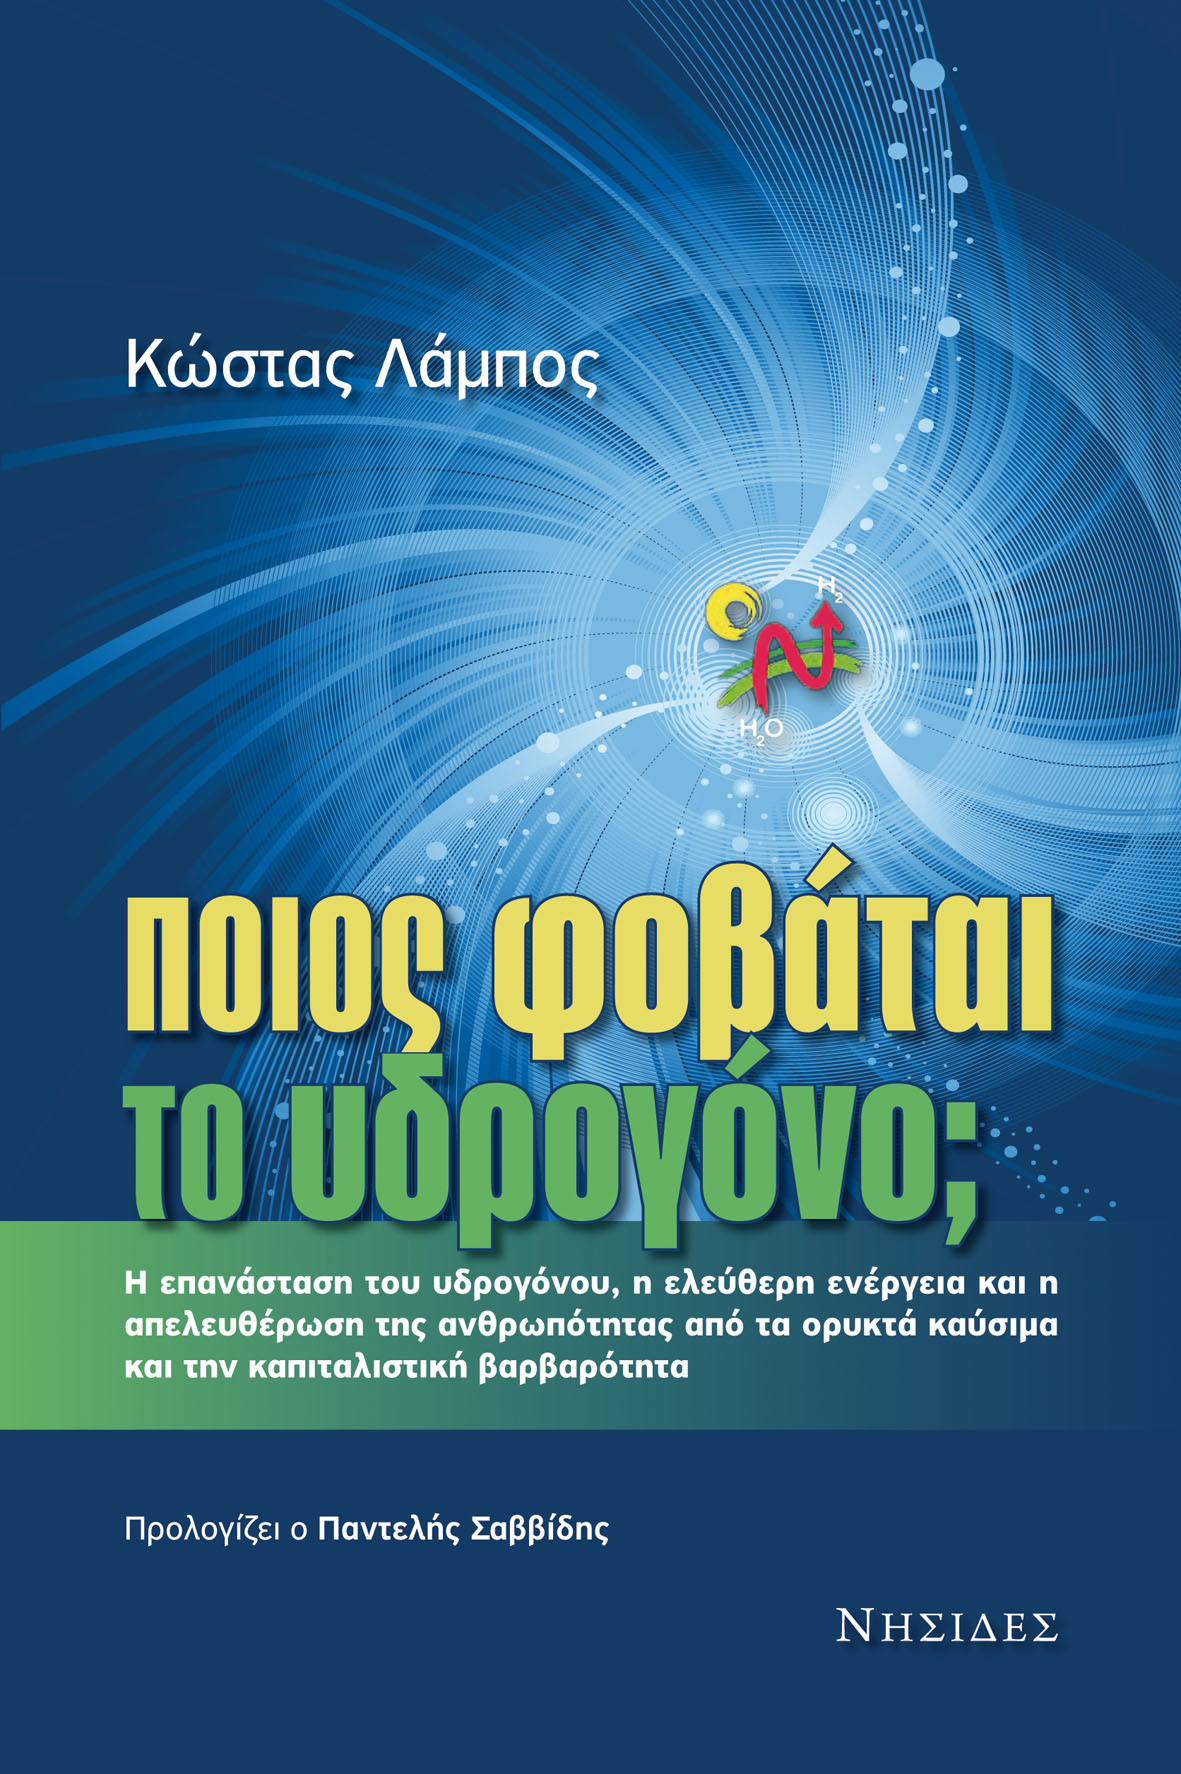 Image result for Ποιος Φοβάται το υδρογόνο;